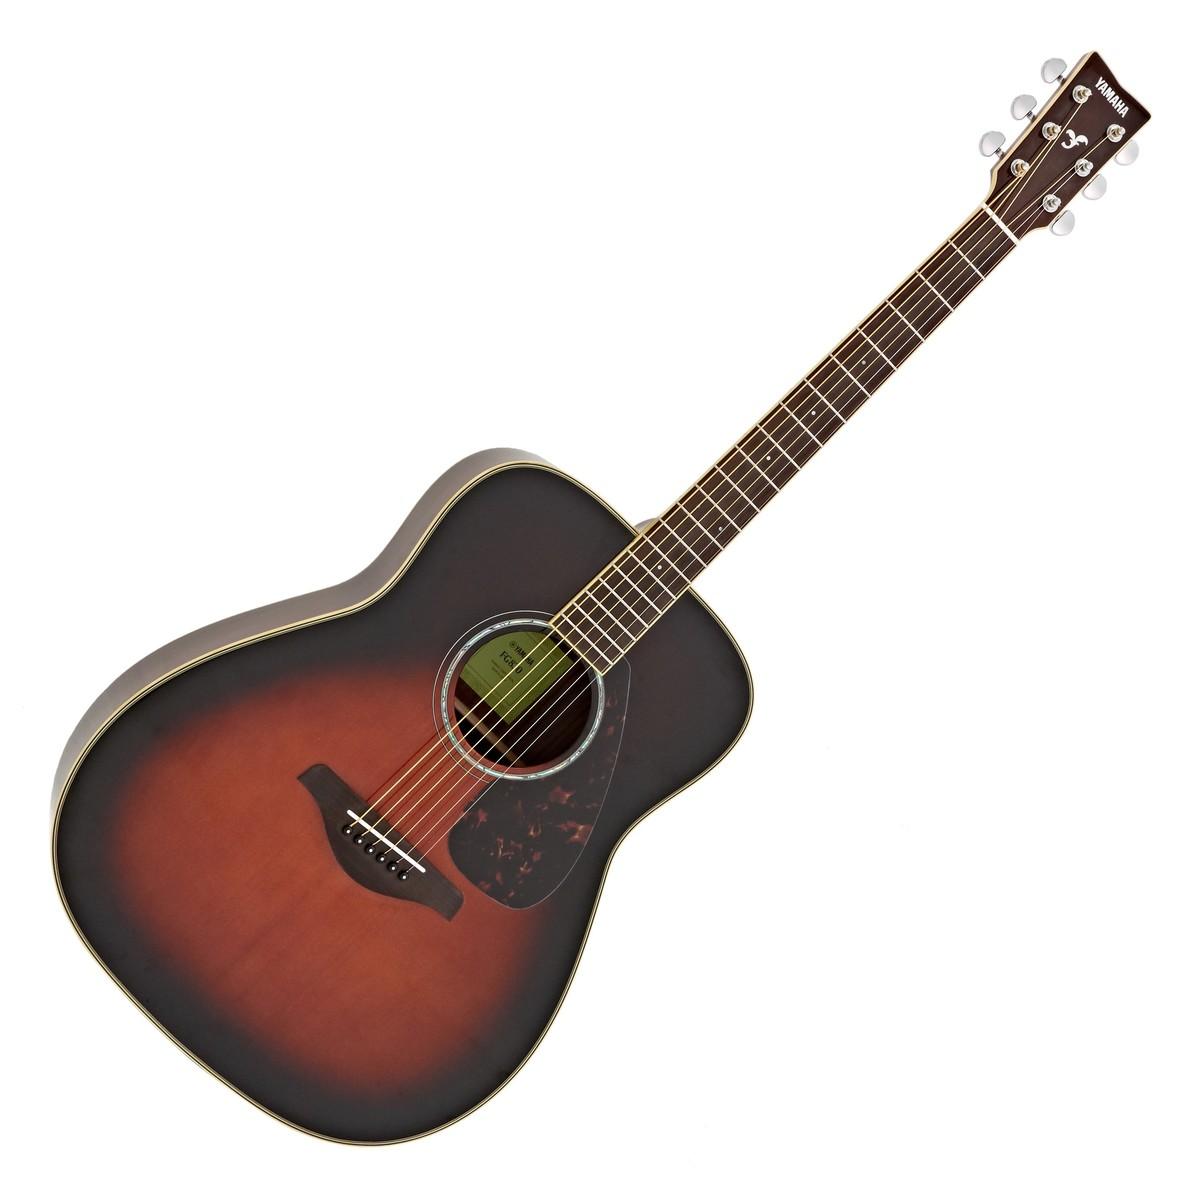 dccb3f6bcd Yamaha FG830 Acoustic, Tobacco Brown Sunburst. Loading zoom